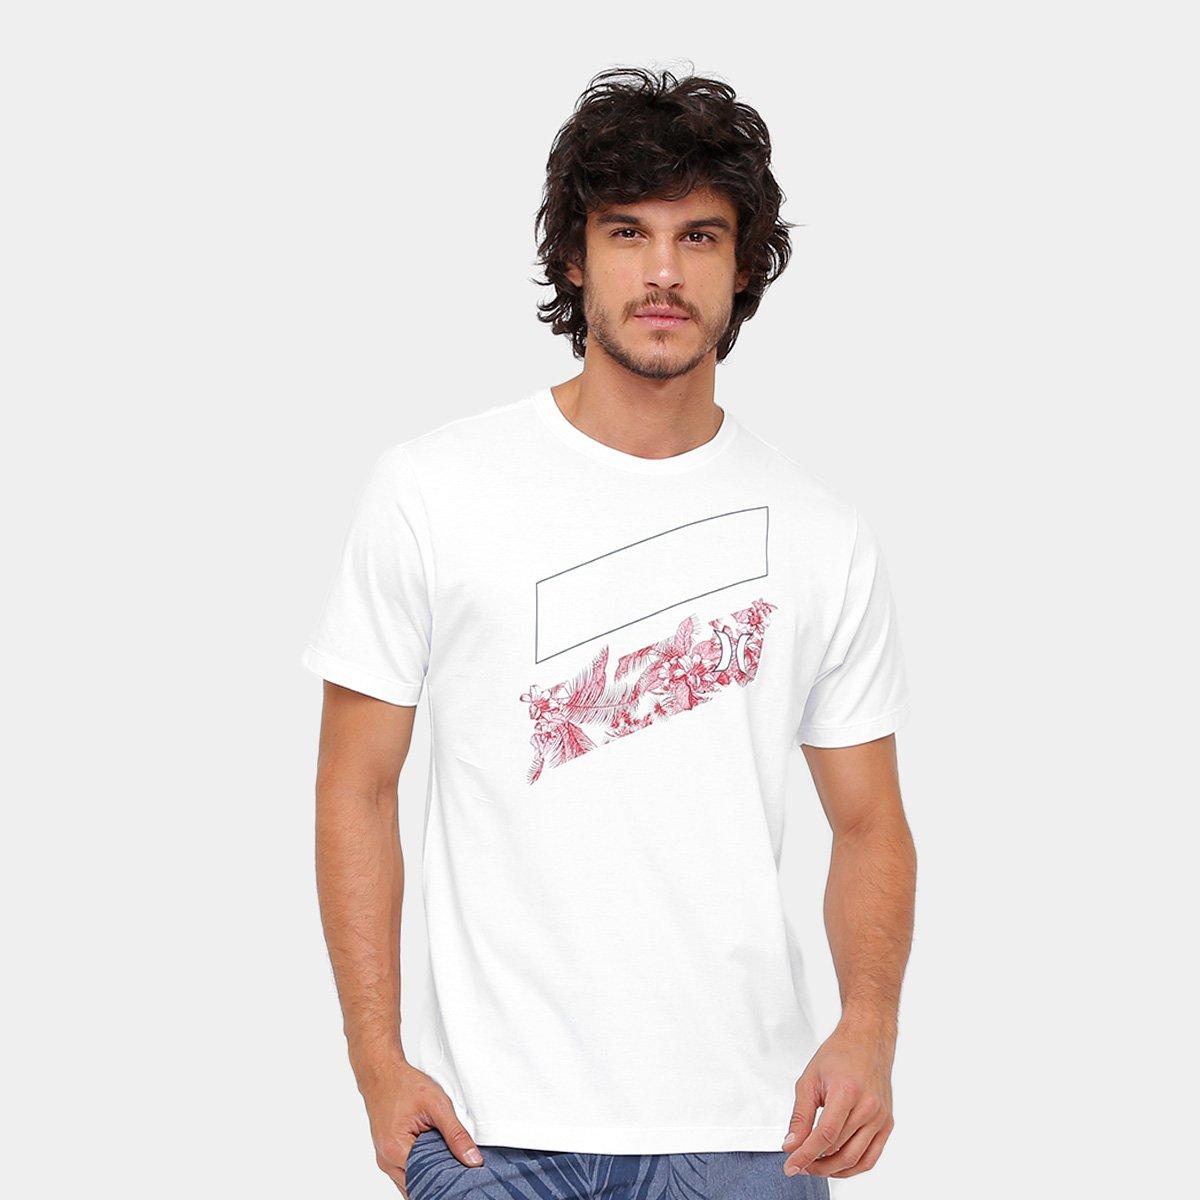 f43fdb27bb018 Camiseta Hurley Silk Icon Slash Hilo Masculina - Compre Agora